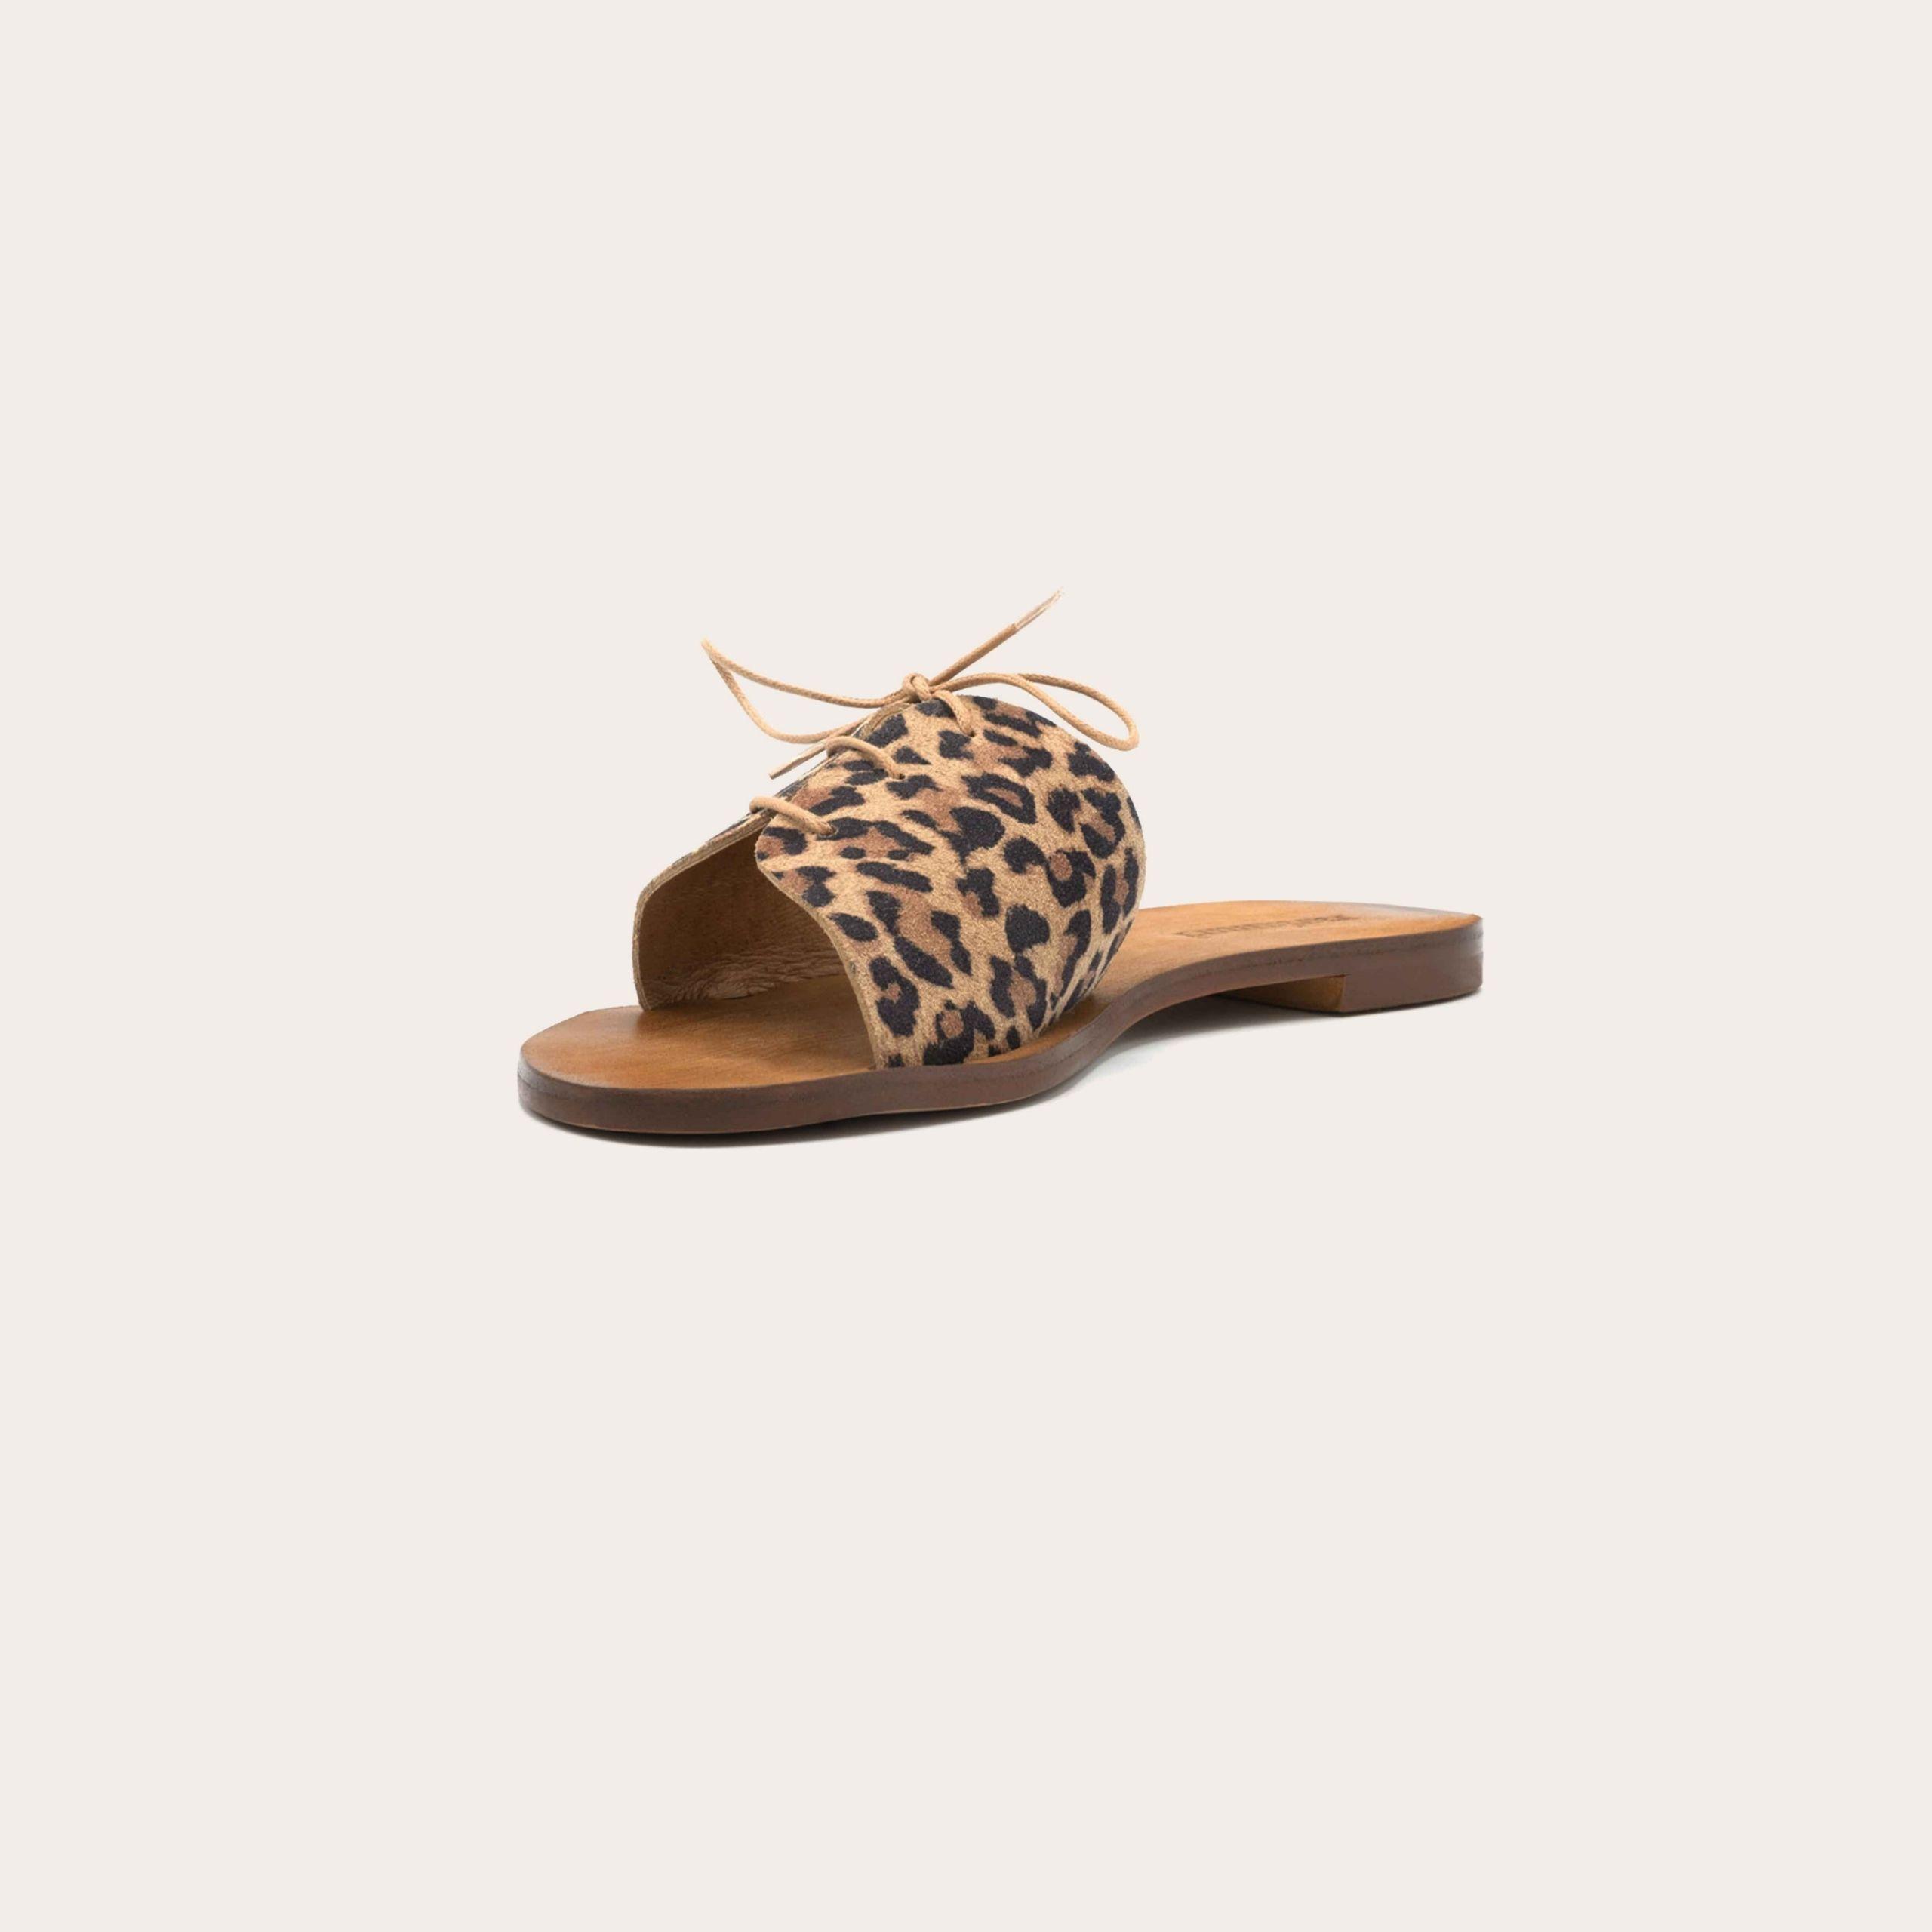 cali-leopard_4_lintsandalen sandals travelsandals vegan sustainable sandals wikkelsandalen